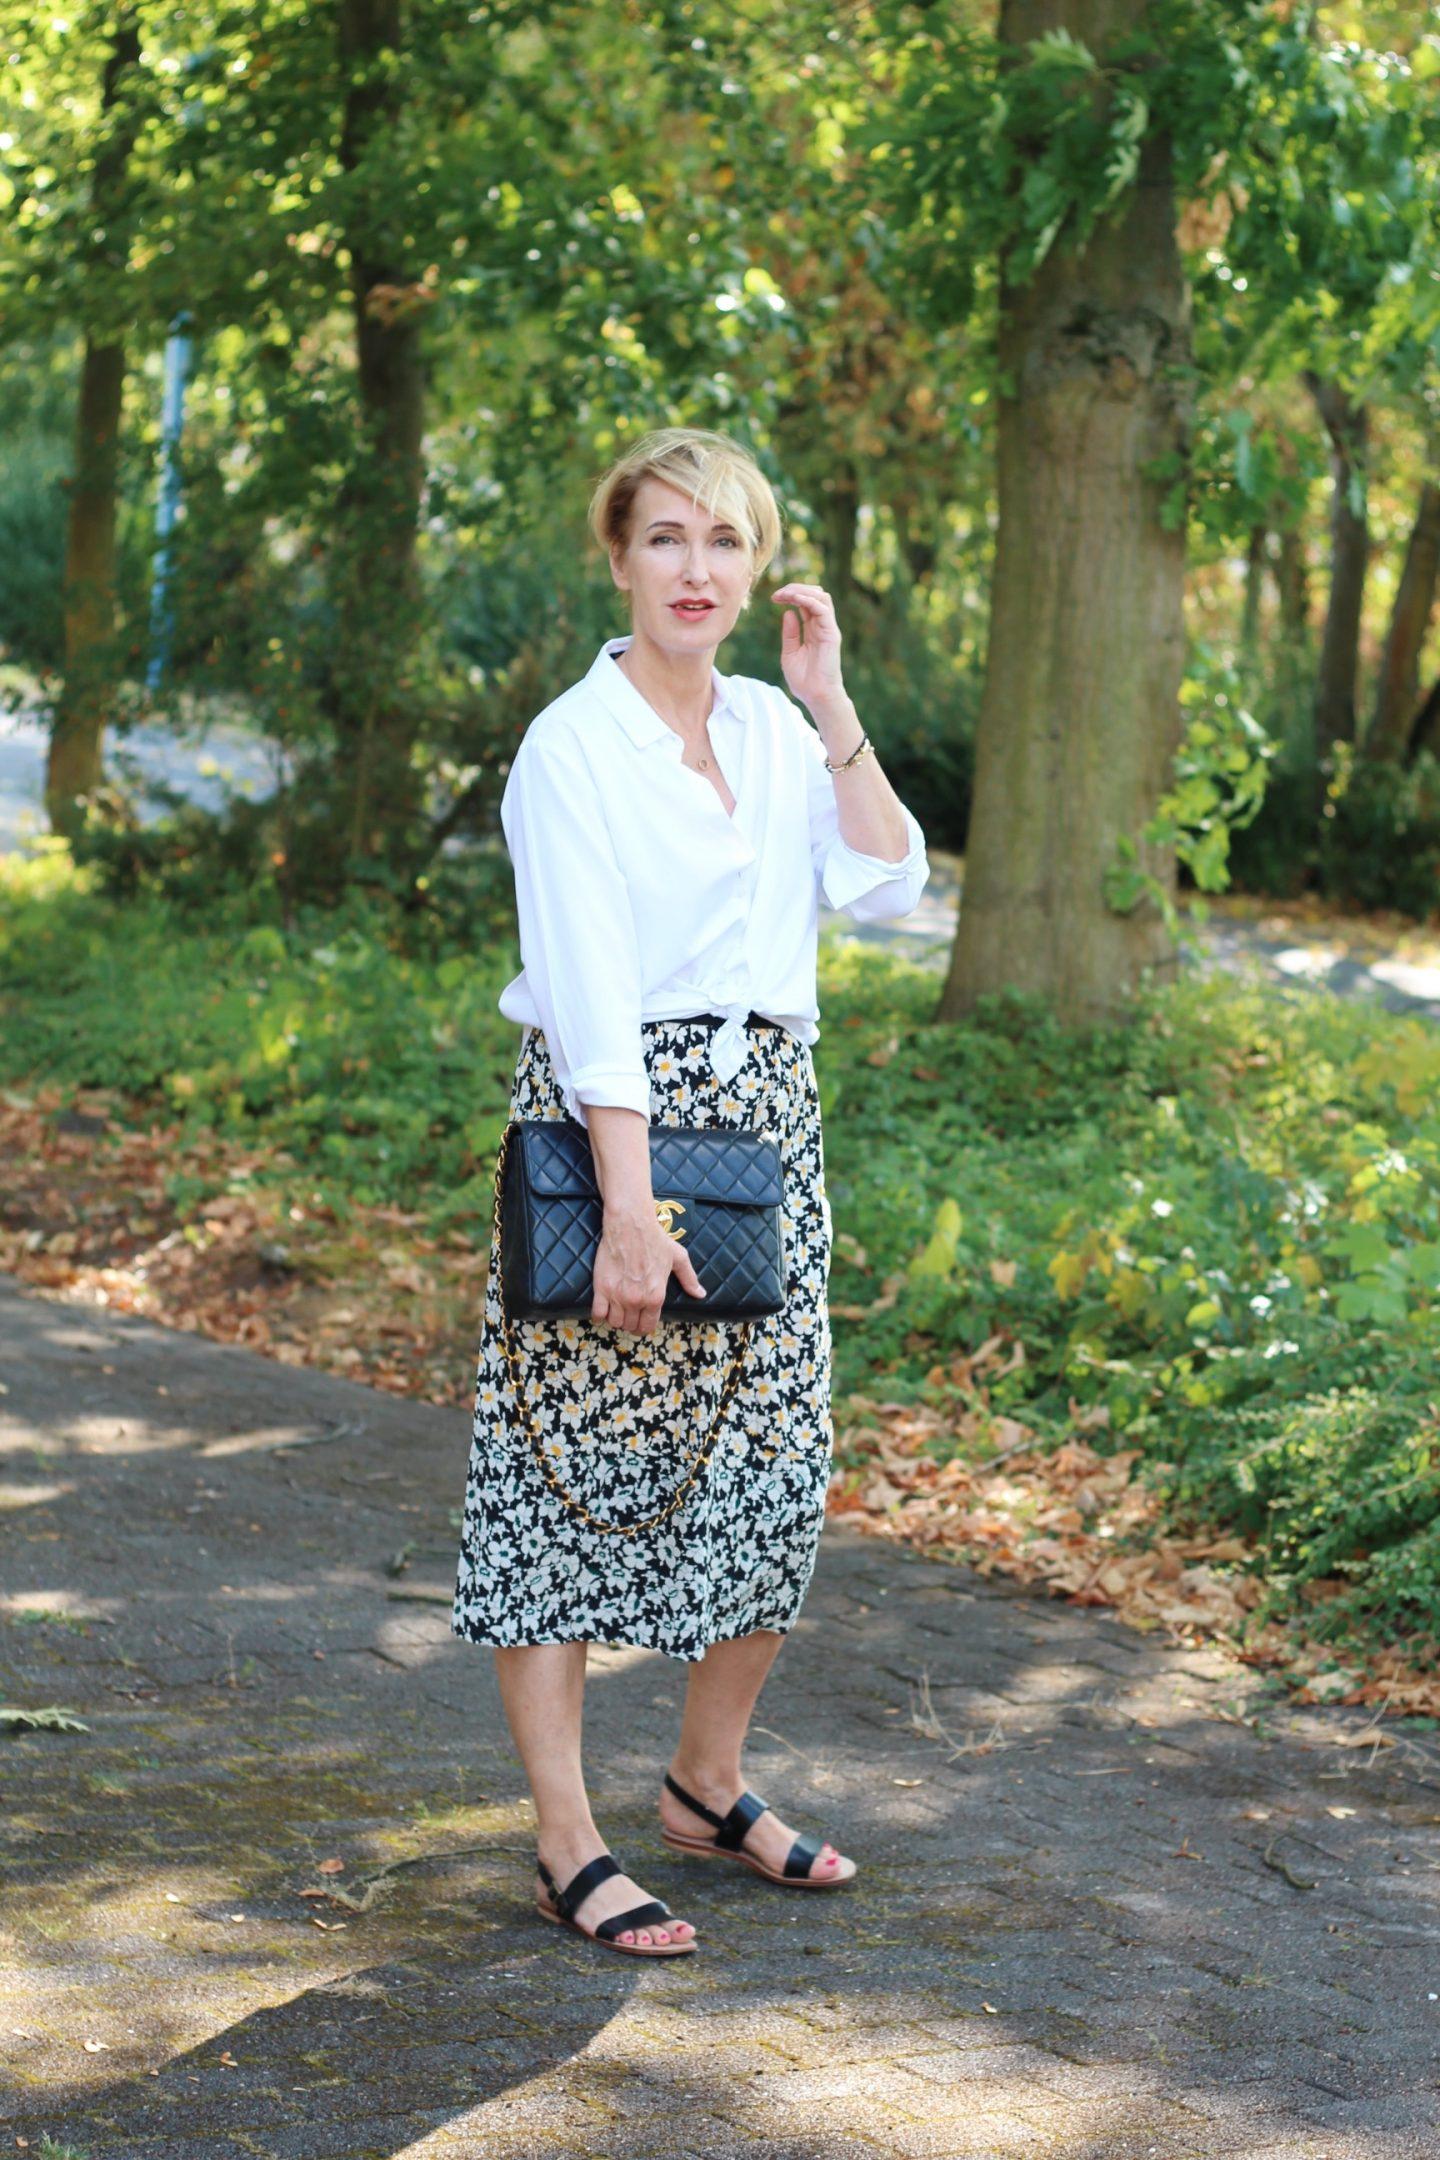 glamupyourlifestyle vintage vintage-klassiker ladybloggers modeflüsterin ü-40-blog ue-40-blog chanel-vintage-tasche